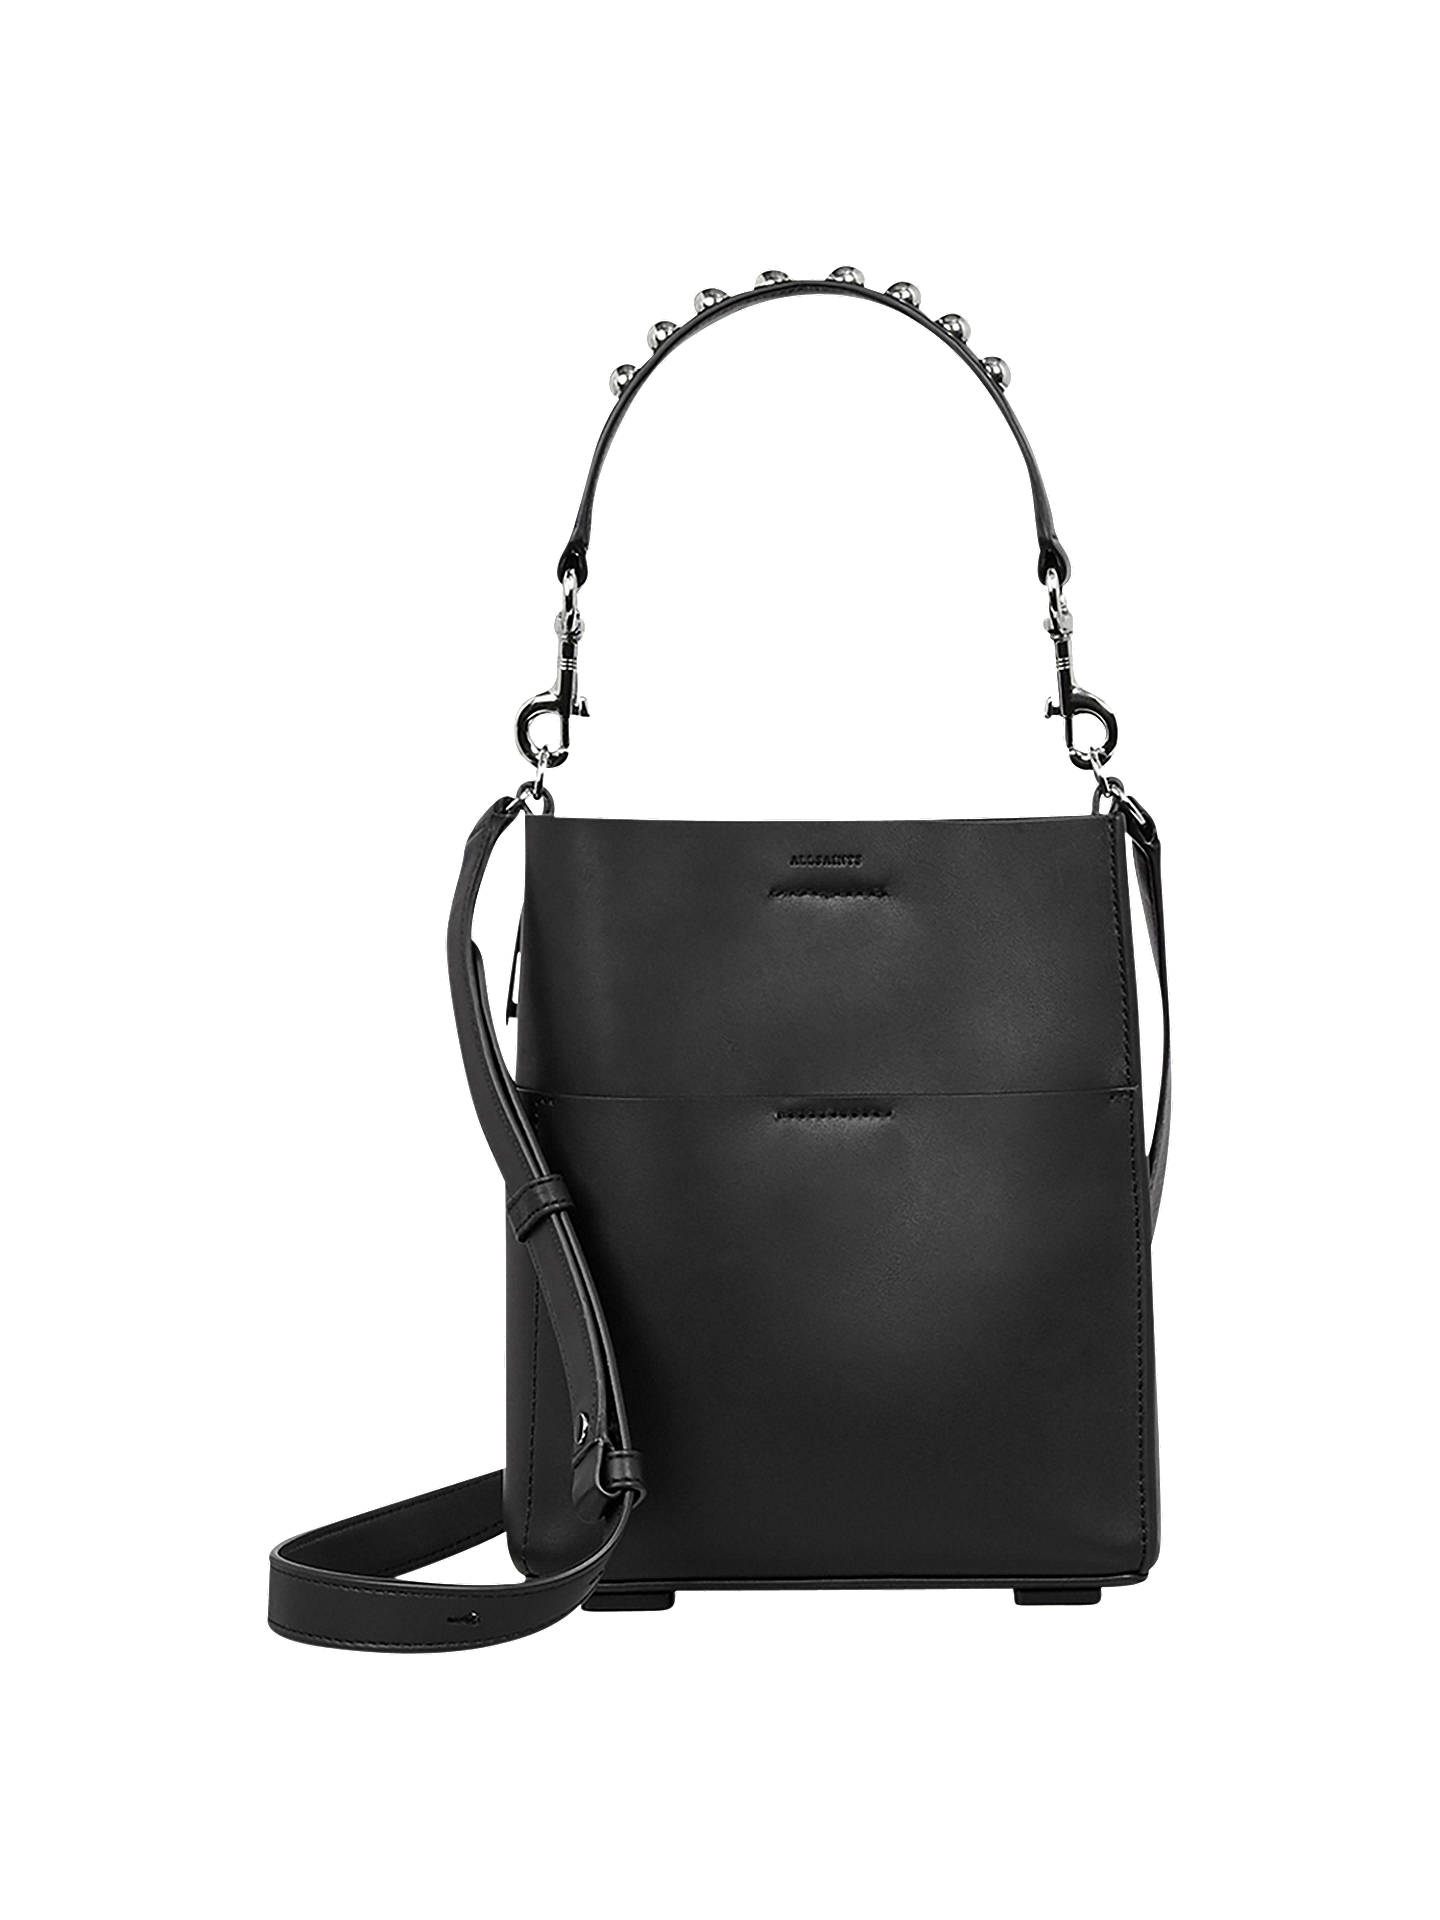 910ddec13 Buy AllSaints Suzi Mini Leather Tote Bag, Black Online at johnlewis.com ...